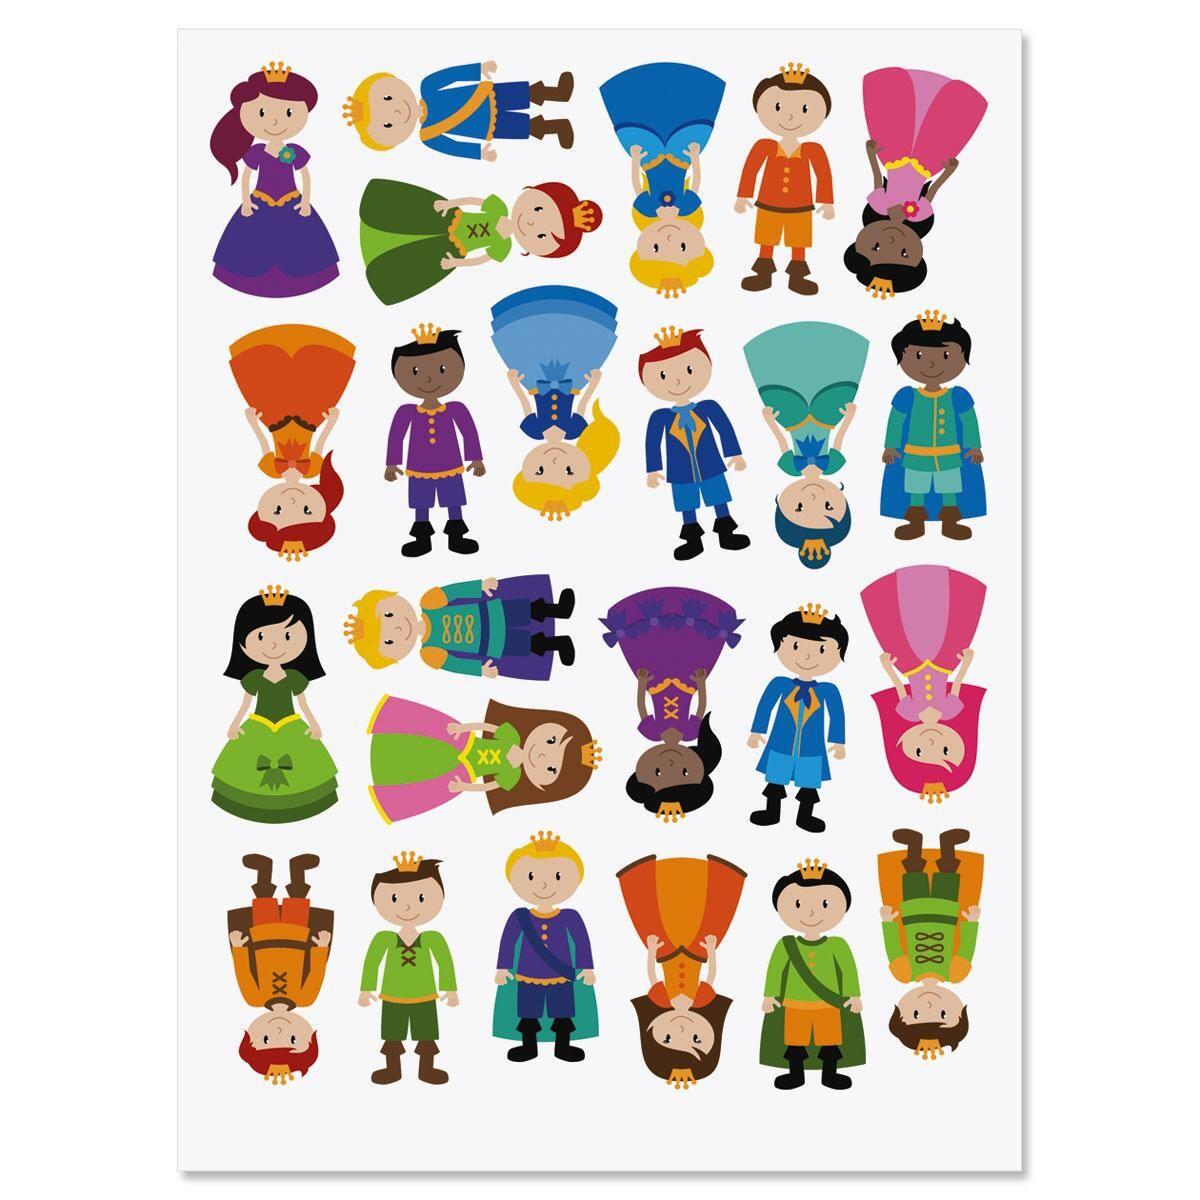 Prince and Princess Stickers